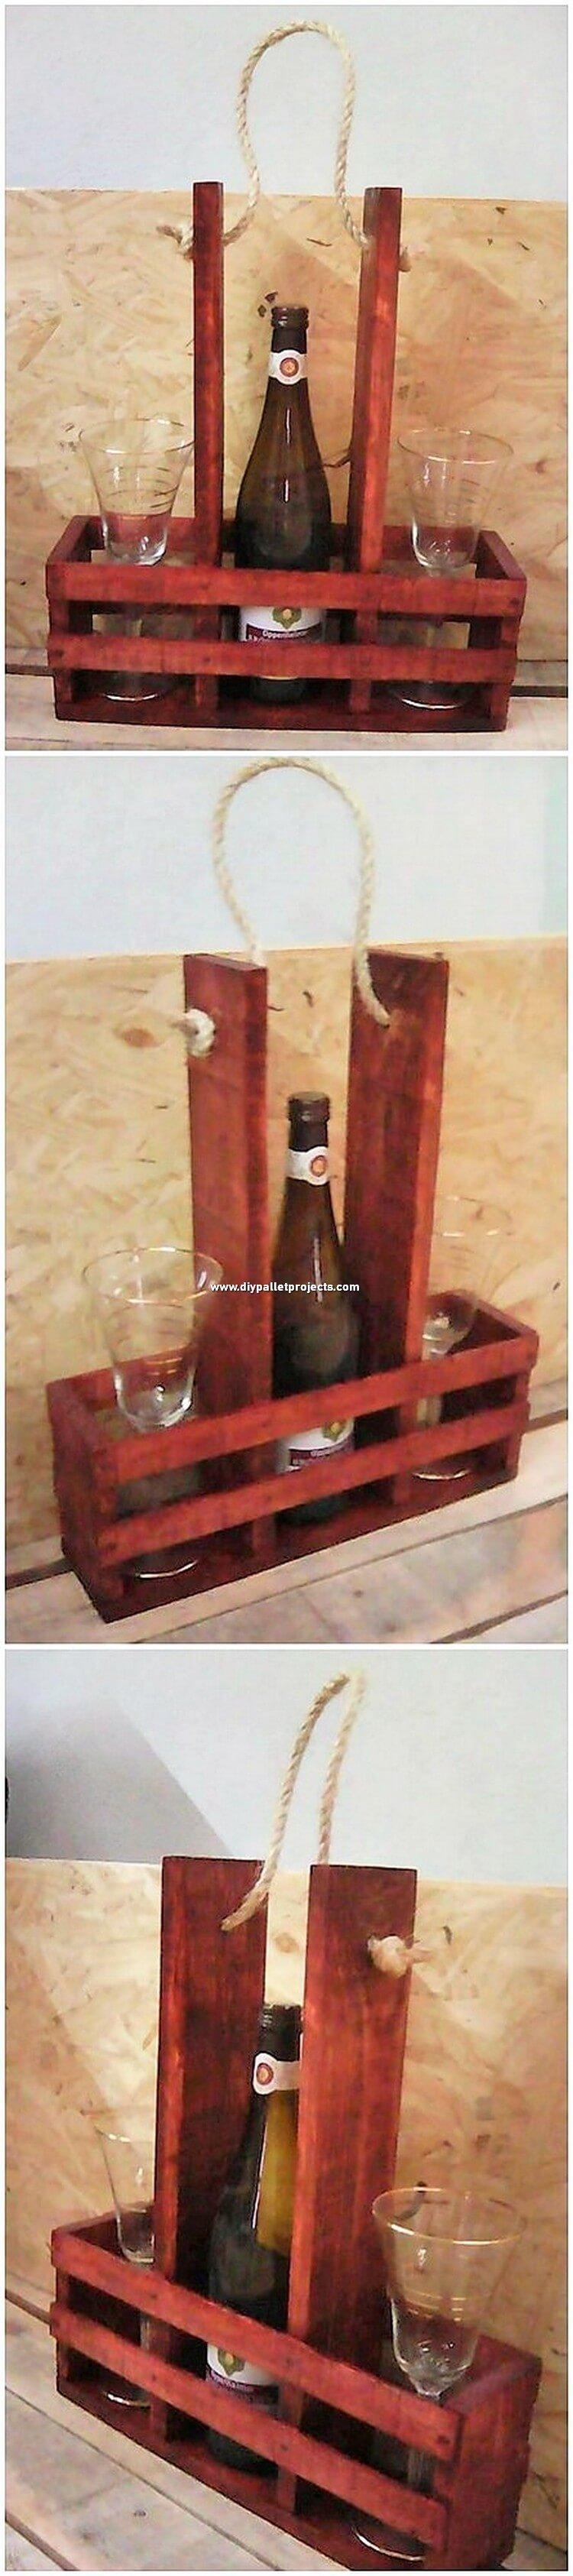 Pallet Wine Bottle Rack